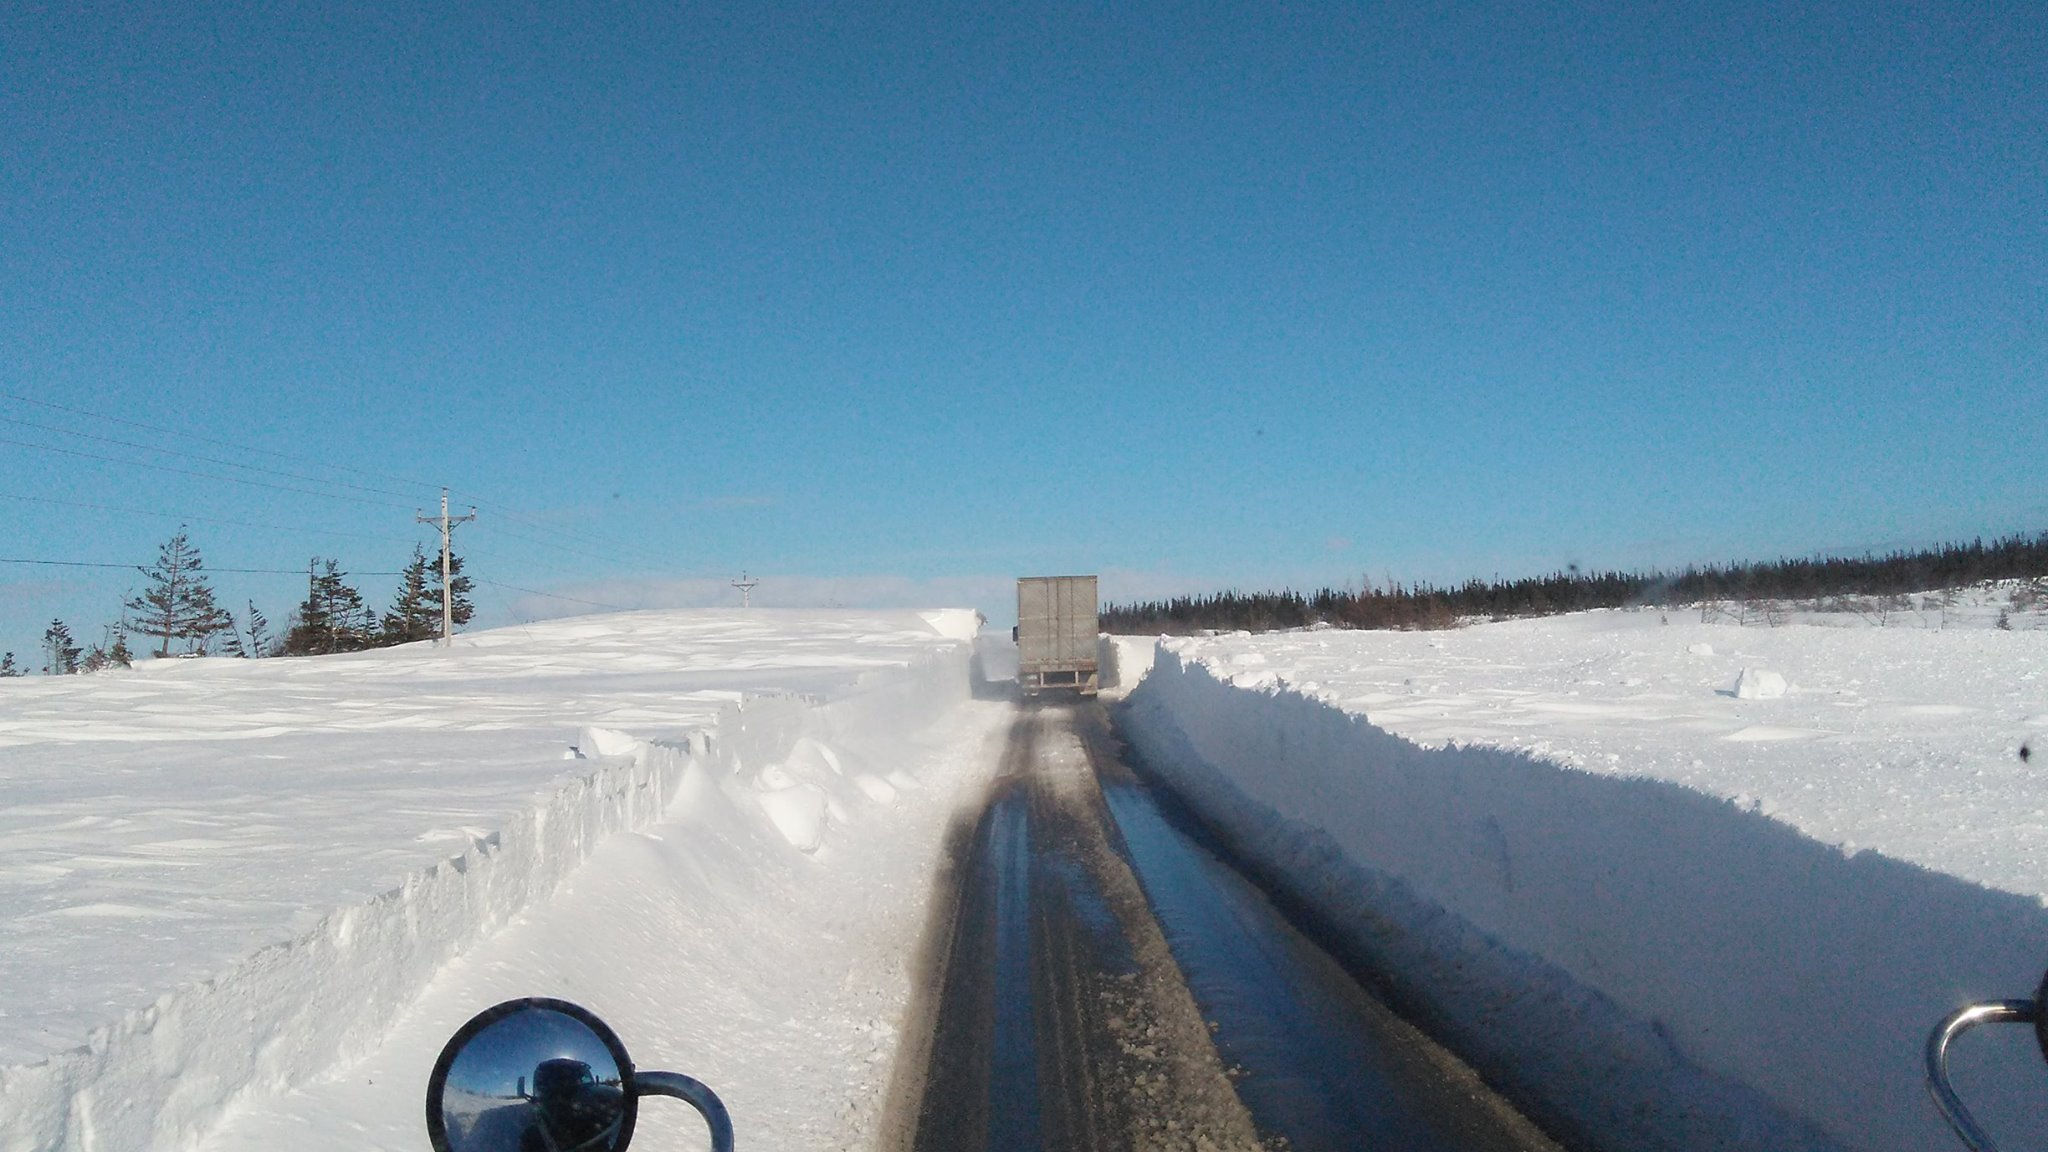 I-think-we-have-enough-snow-Newfoundland--8-4-2019--6